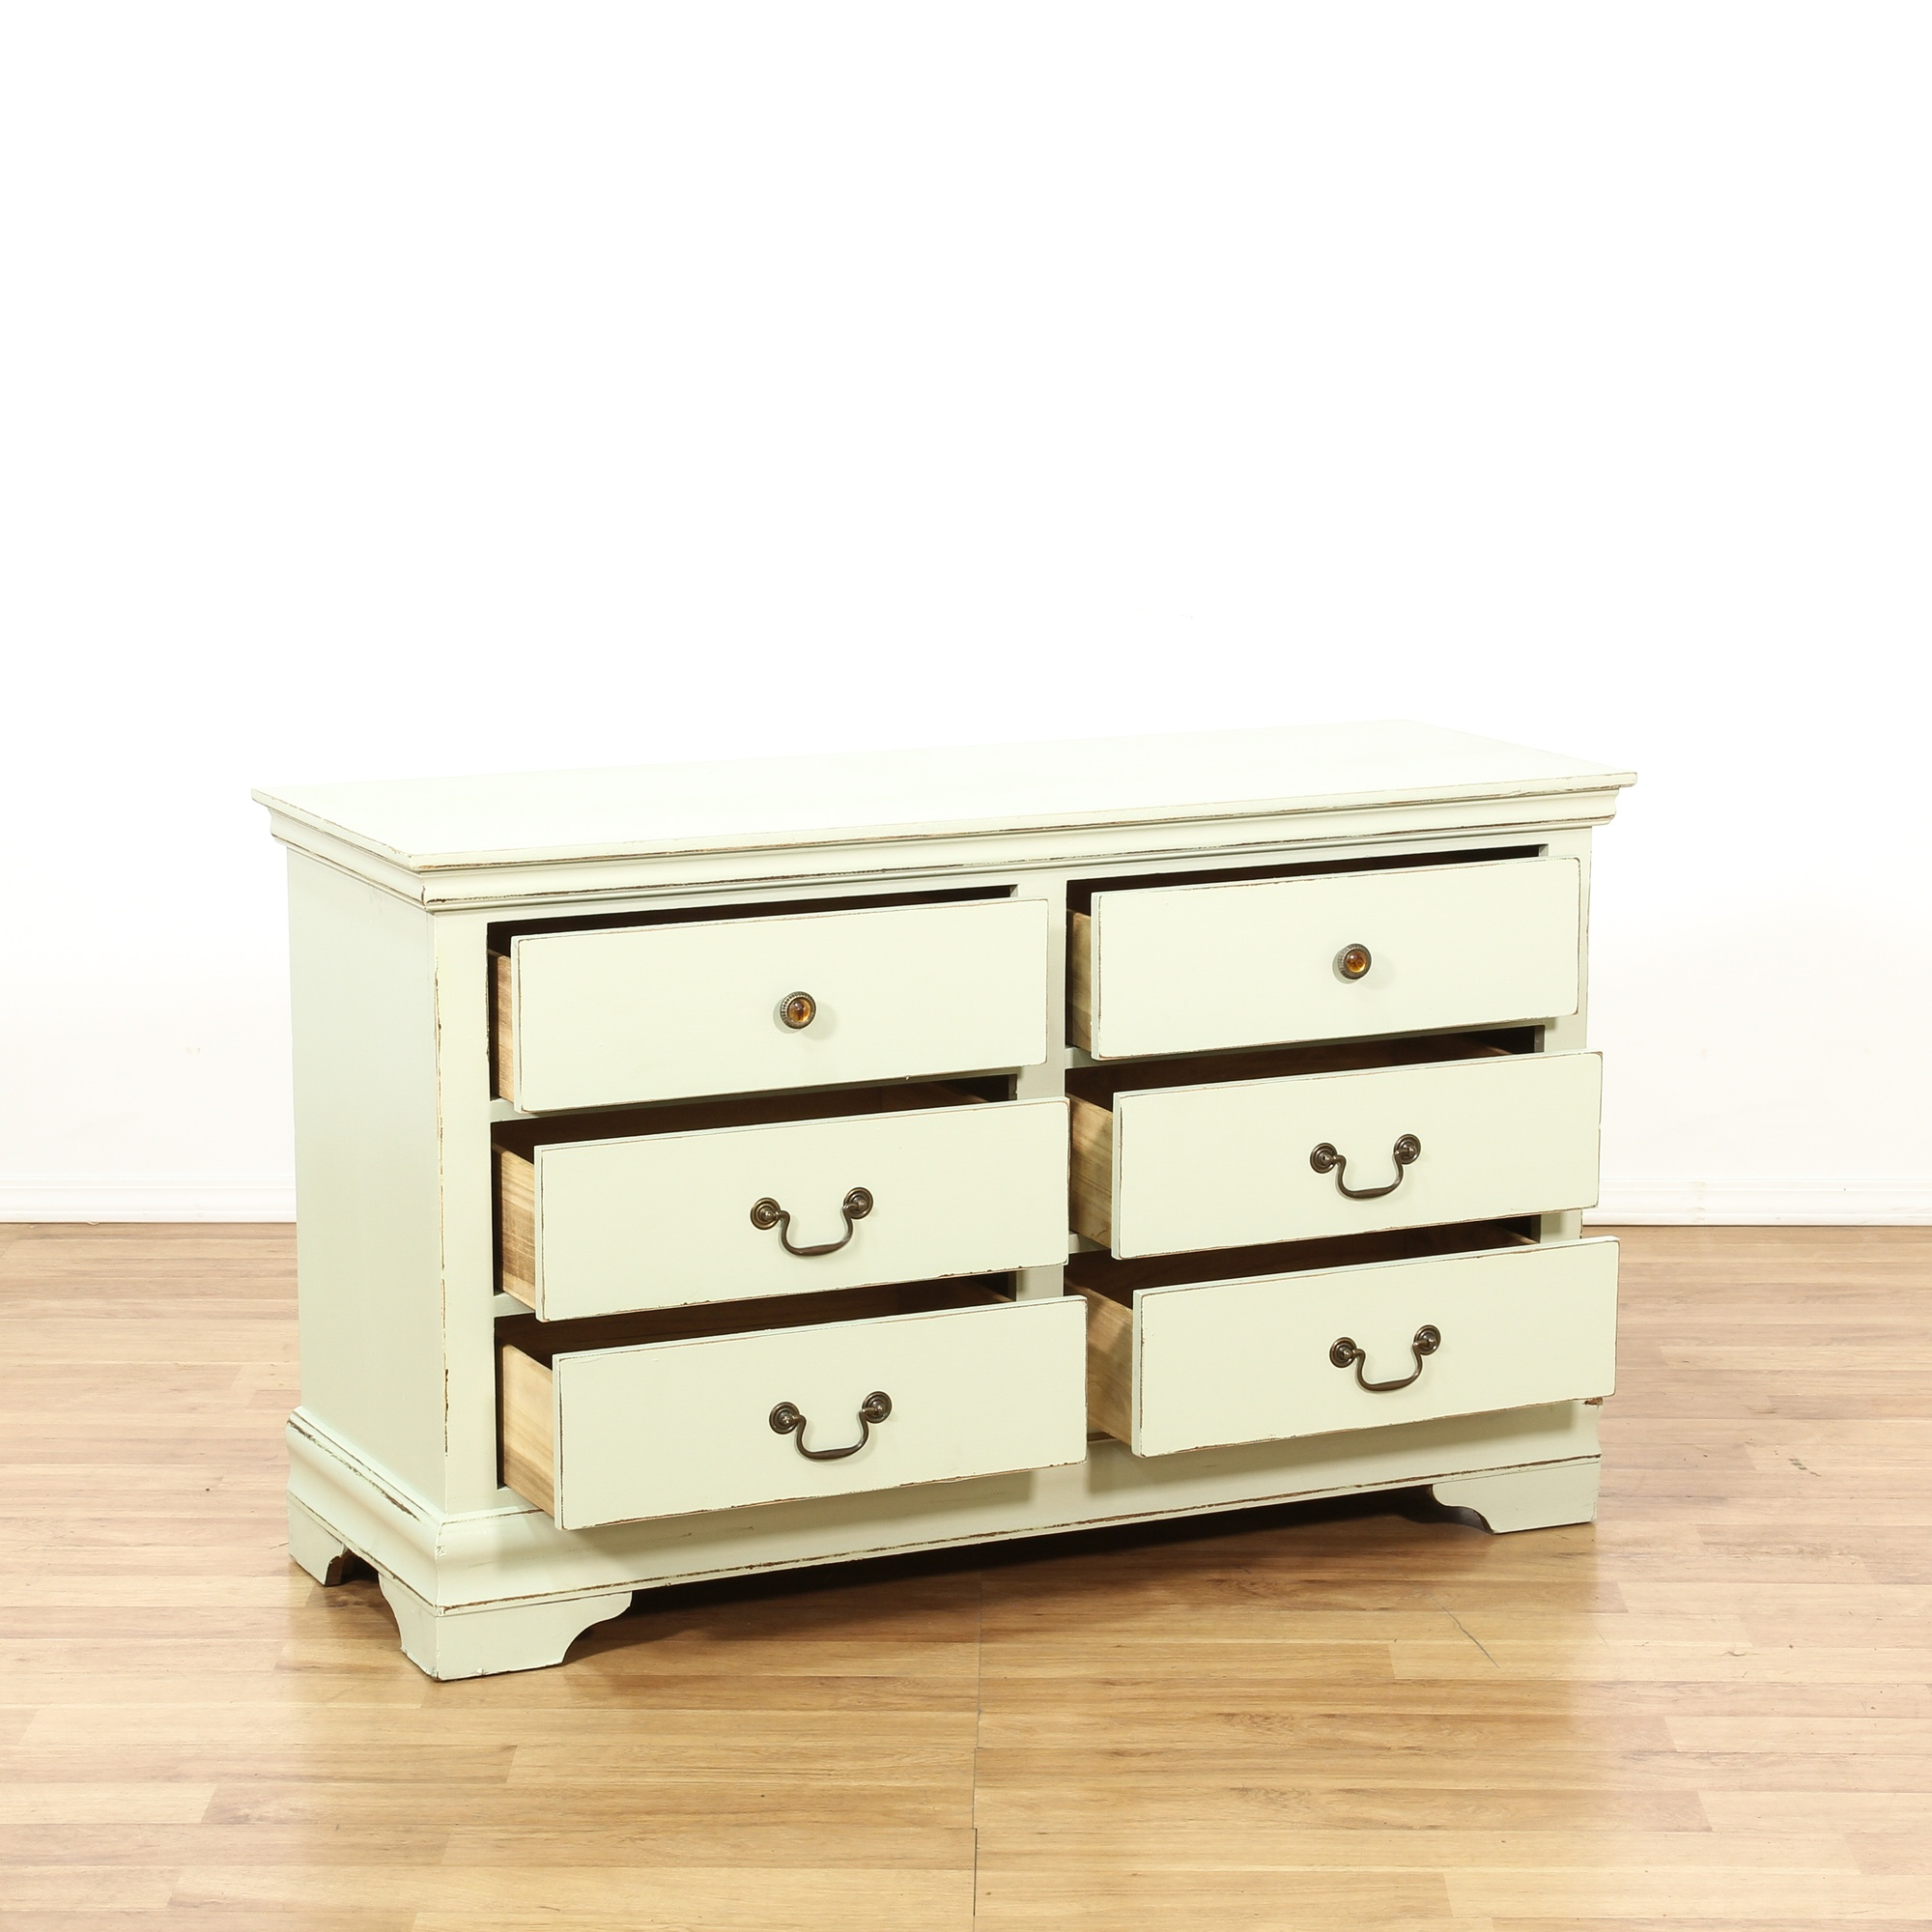 Shabby Chic Off White 6 Drawer Dresser | Loveseat Vintage Furniture San Diego & Los Angeles